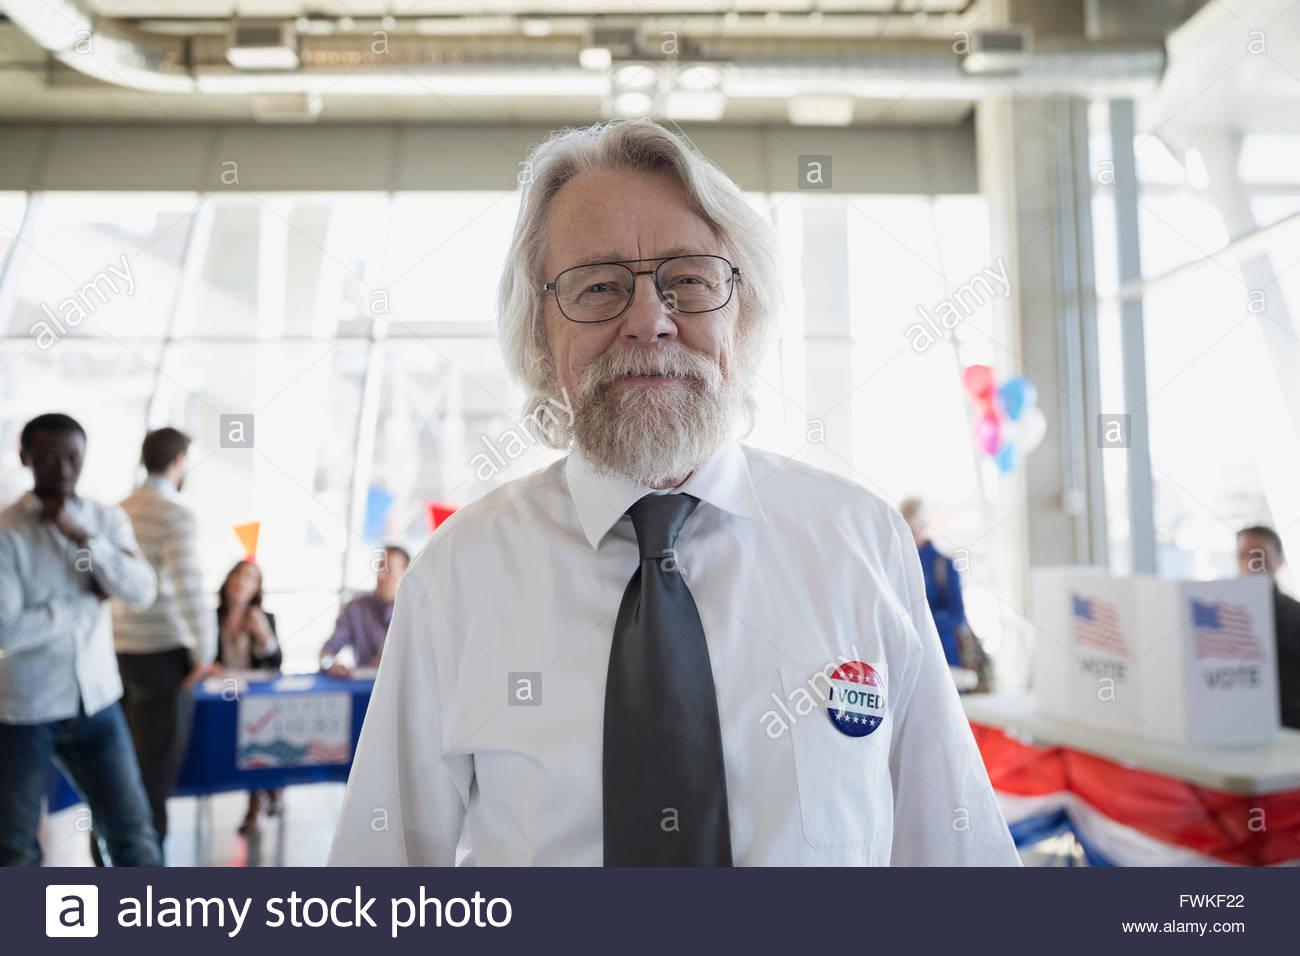 Portrait smiling senior man at voter polling place - Stock Image